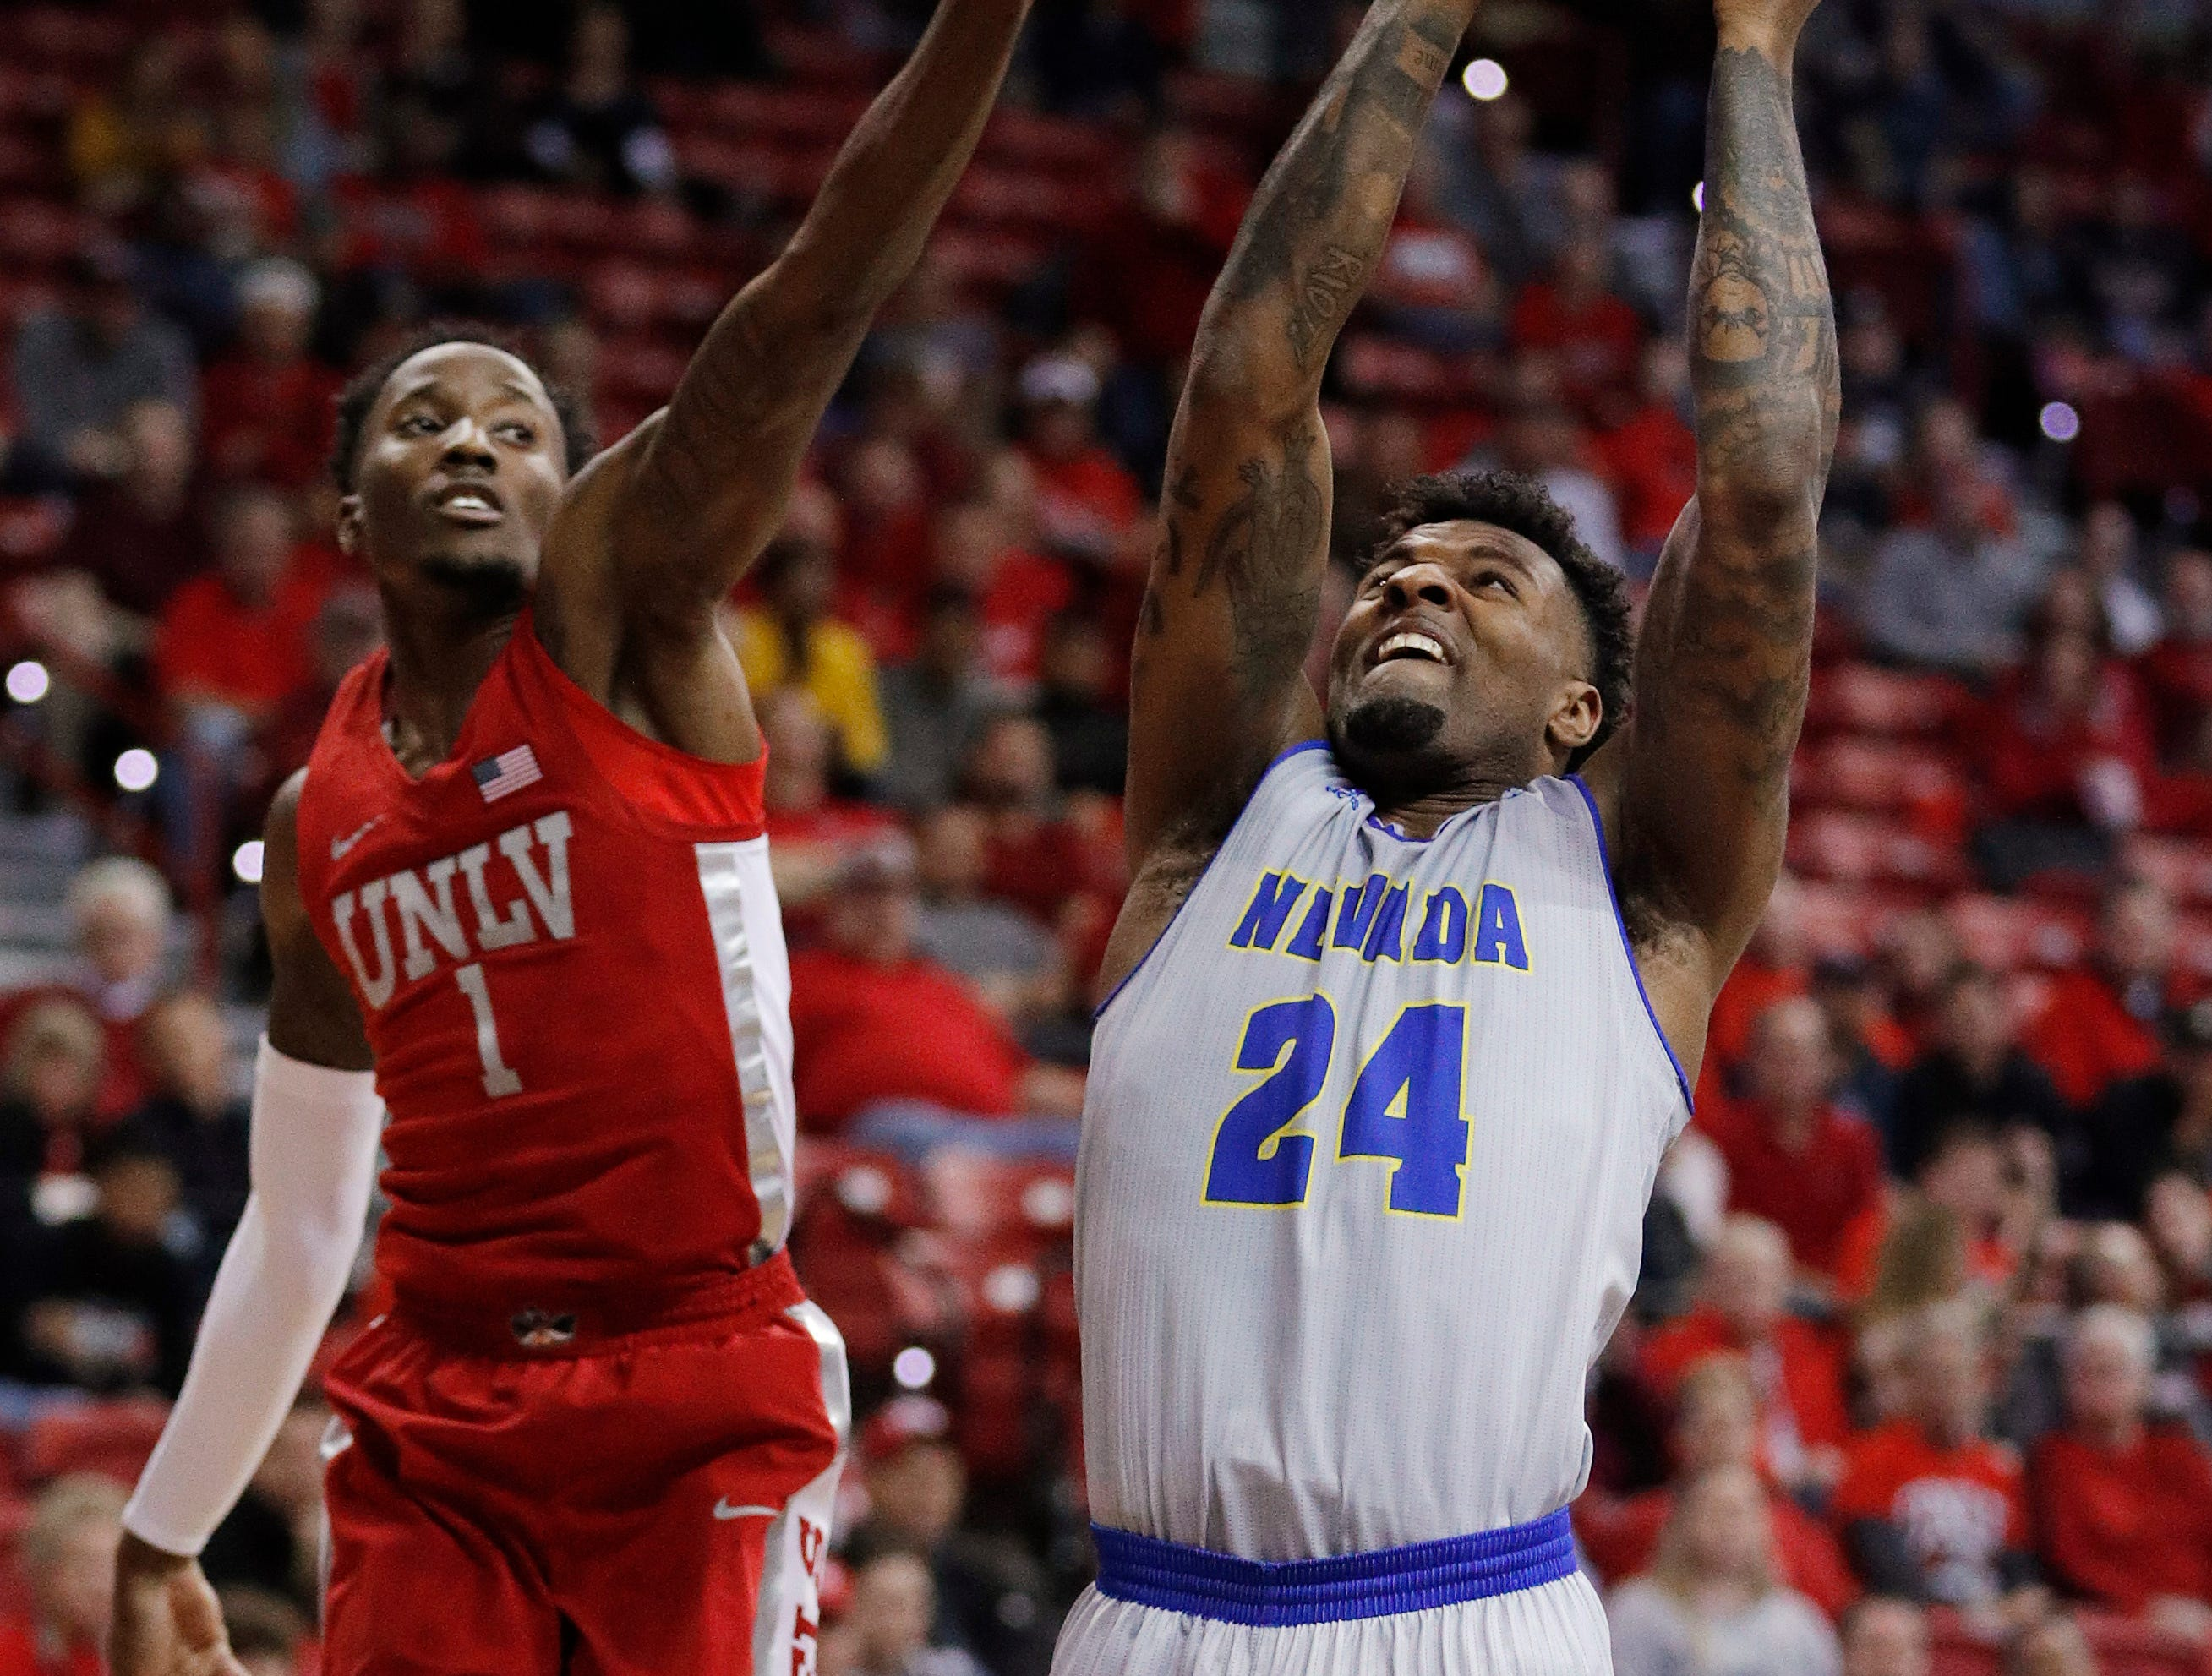 Nevada's Jordan Caroline (24) shoots as UNLV's Kris Clyburn defends during the second half of an NCAA college basketball game Tuesday, Jan. 29, 2019, in Las Vegas. Nevada won 87-70. (AP Photo/John Locher)